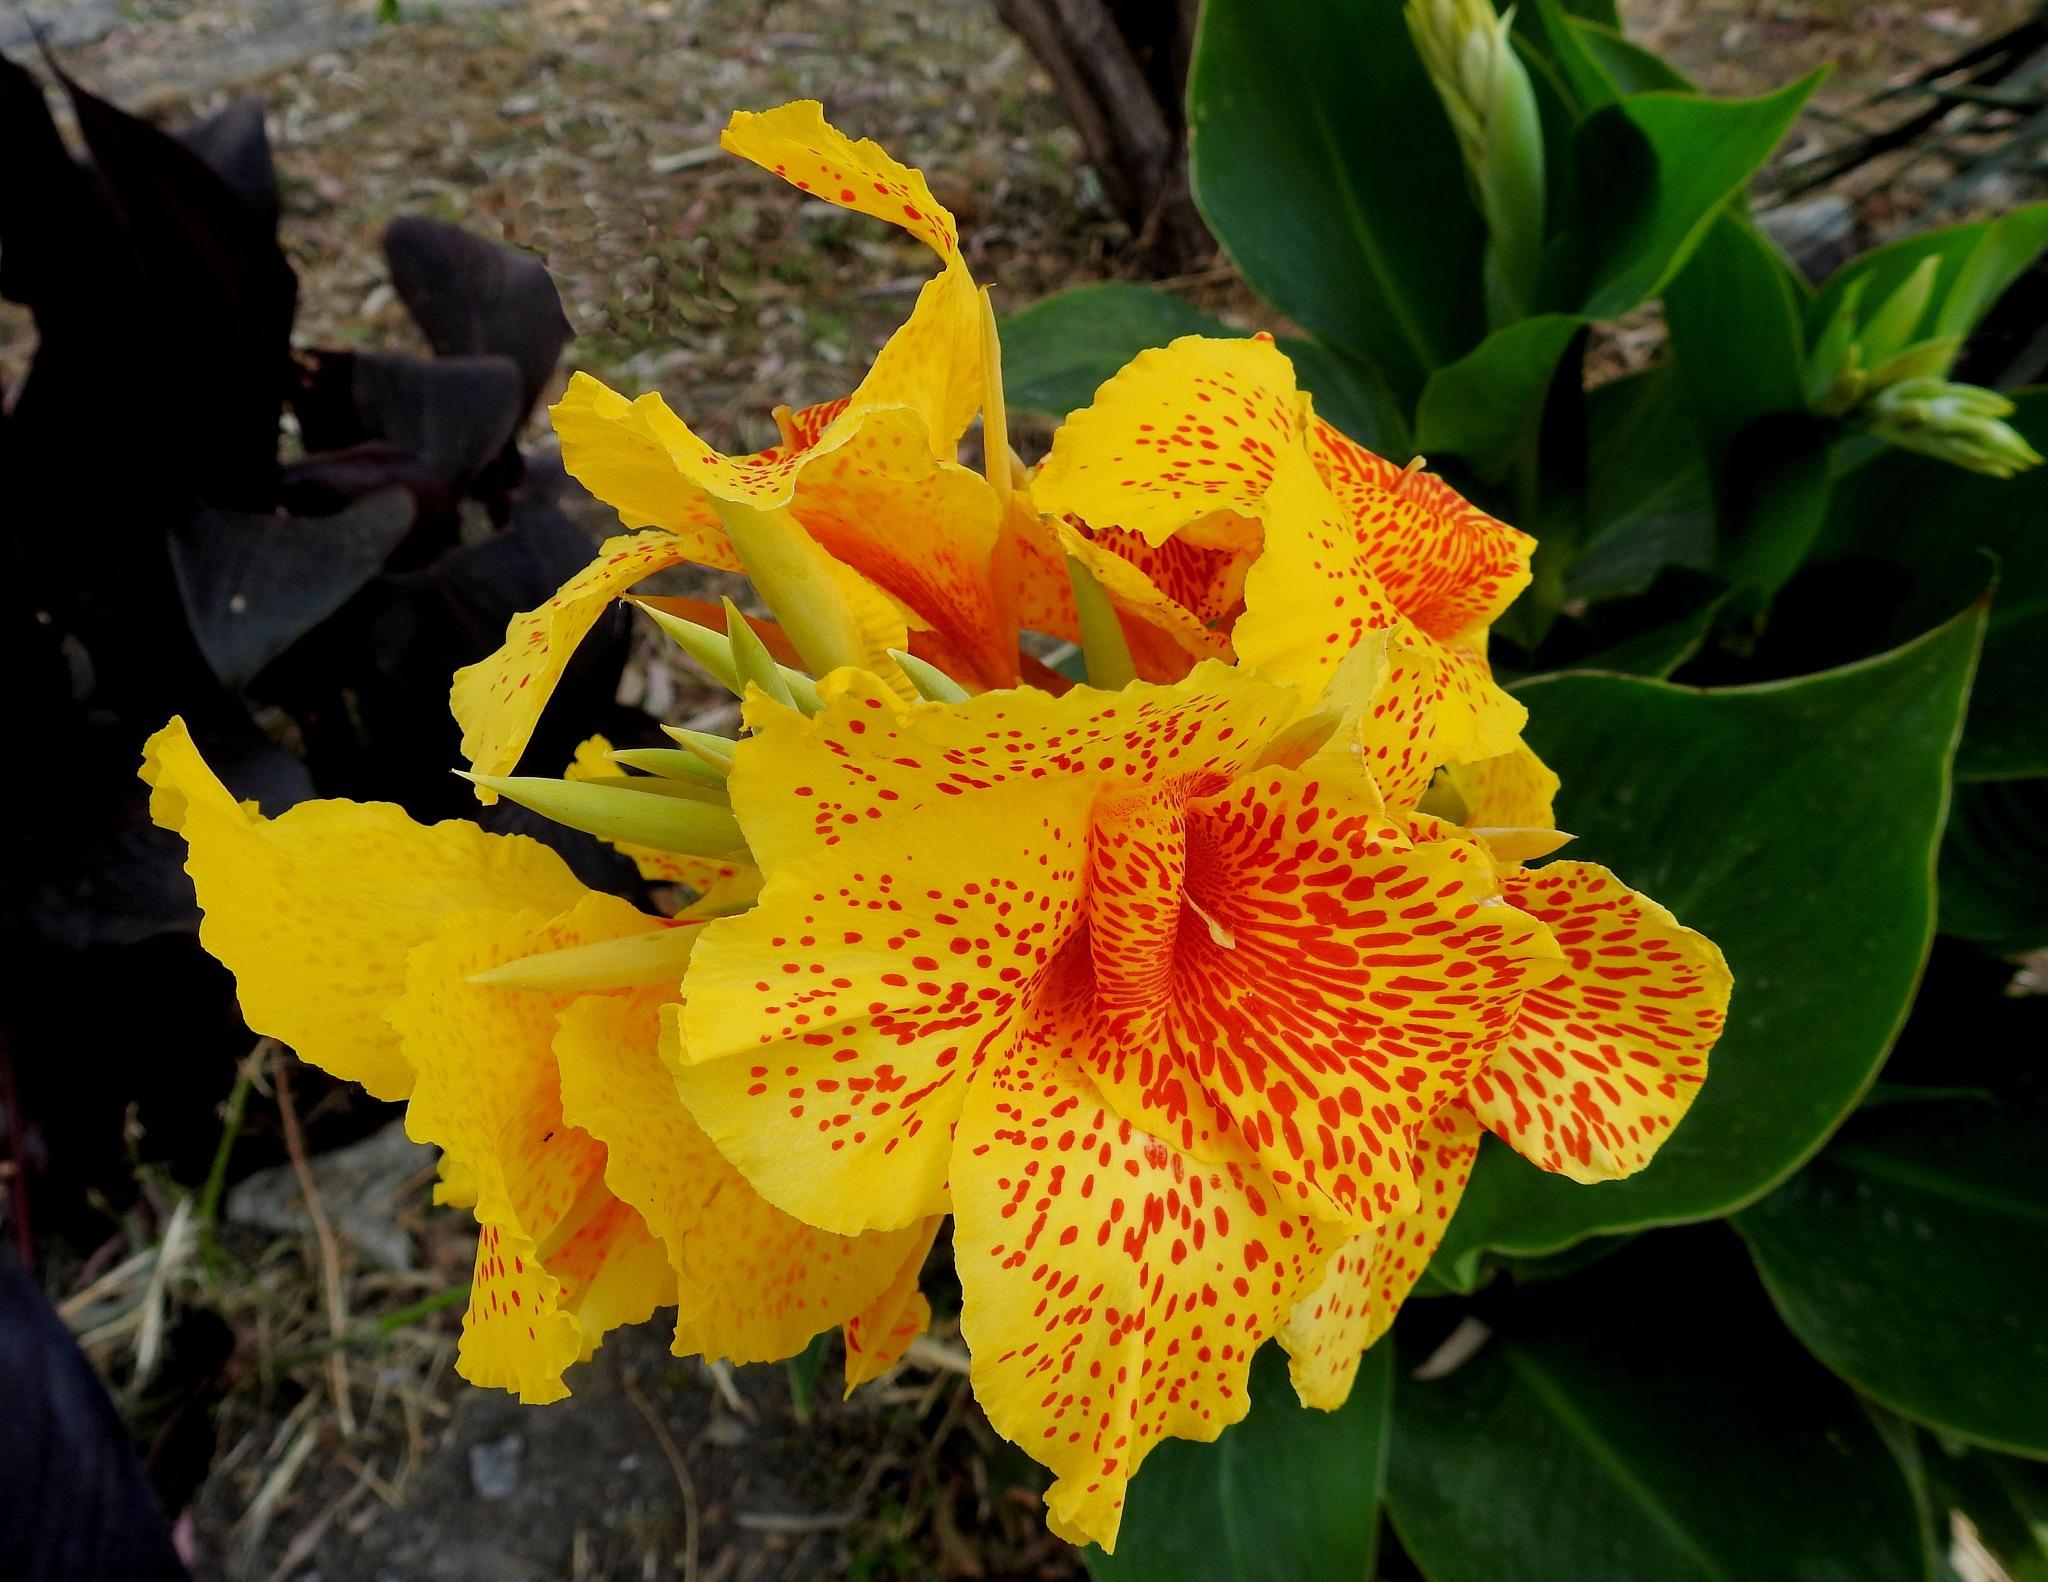 The Flower - La Flor - 5 by Mister Arnauna & Gatto Giuggiolone